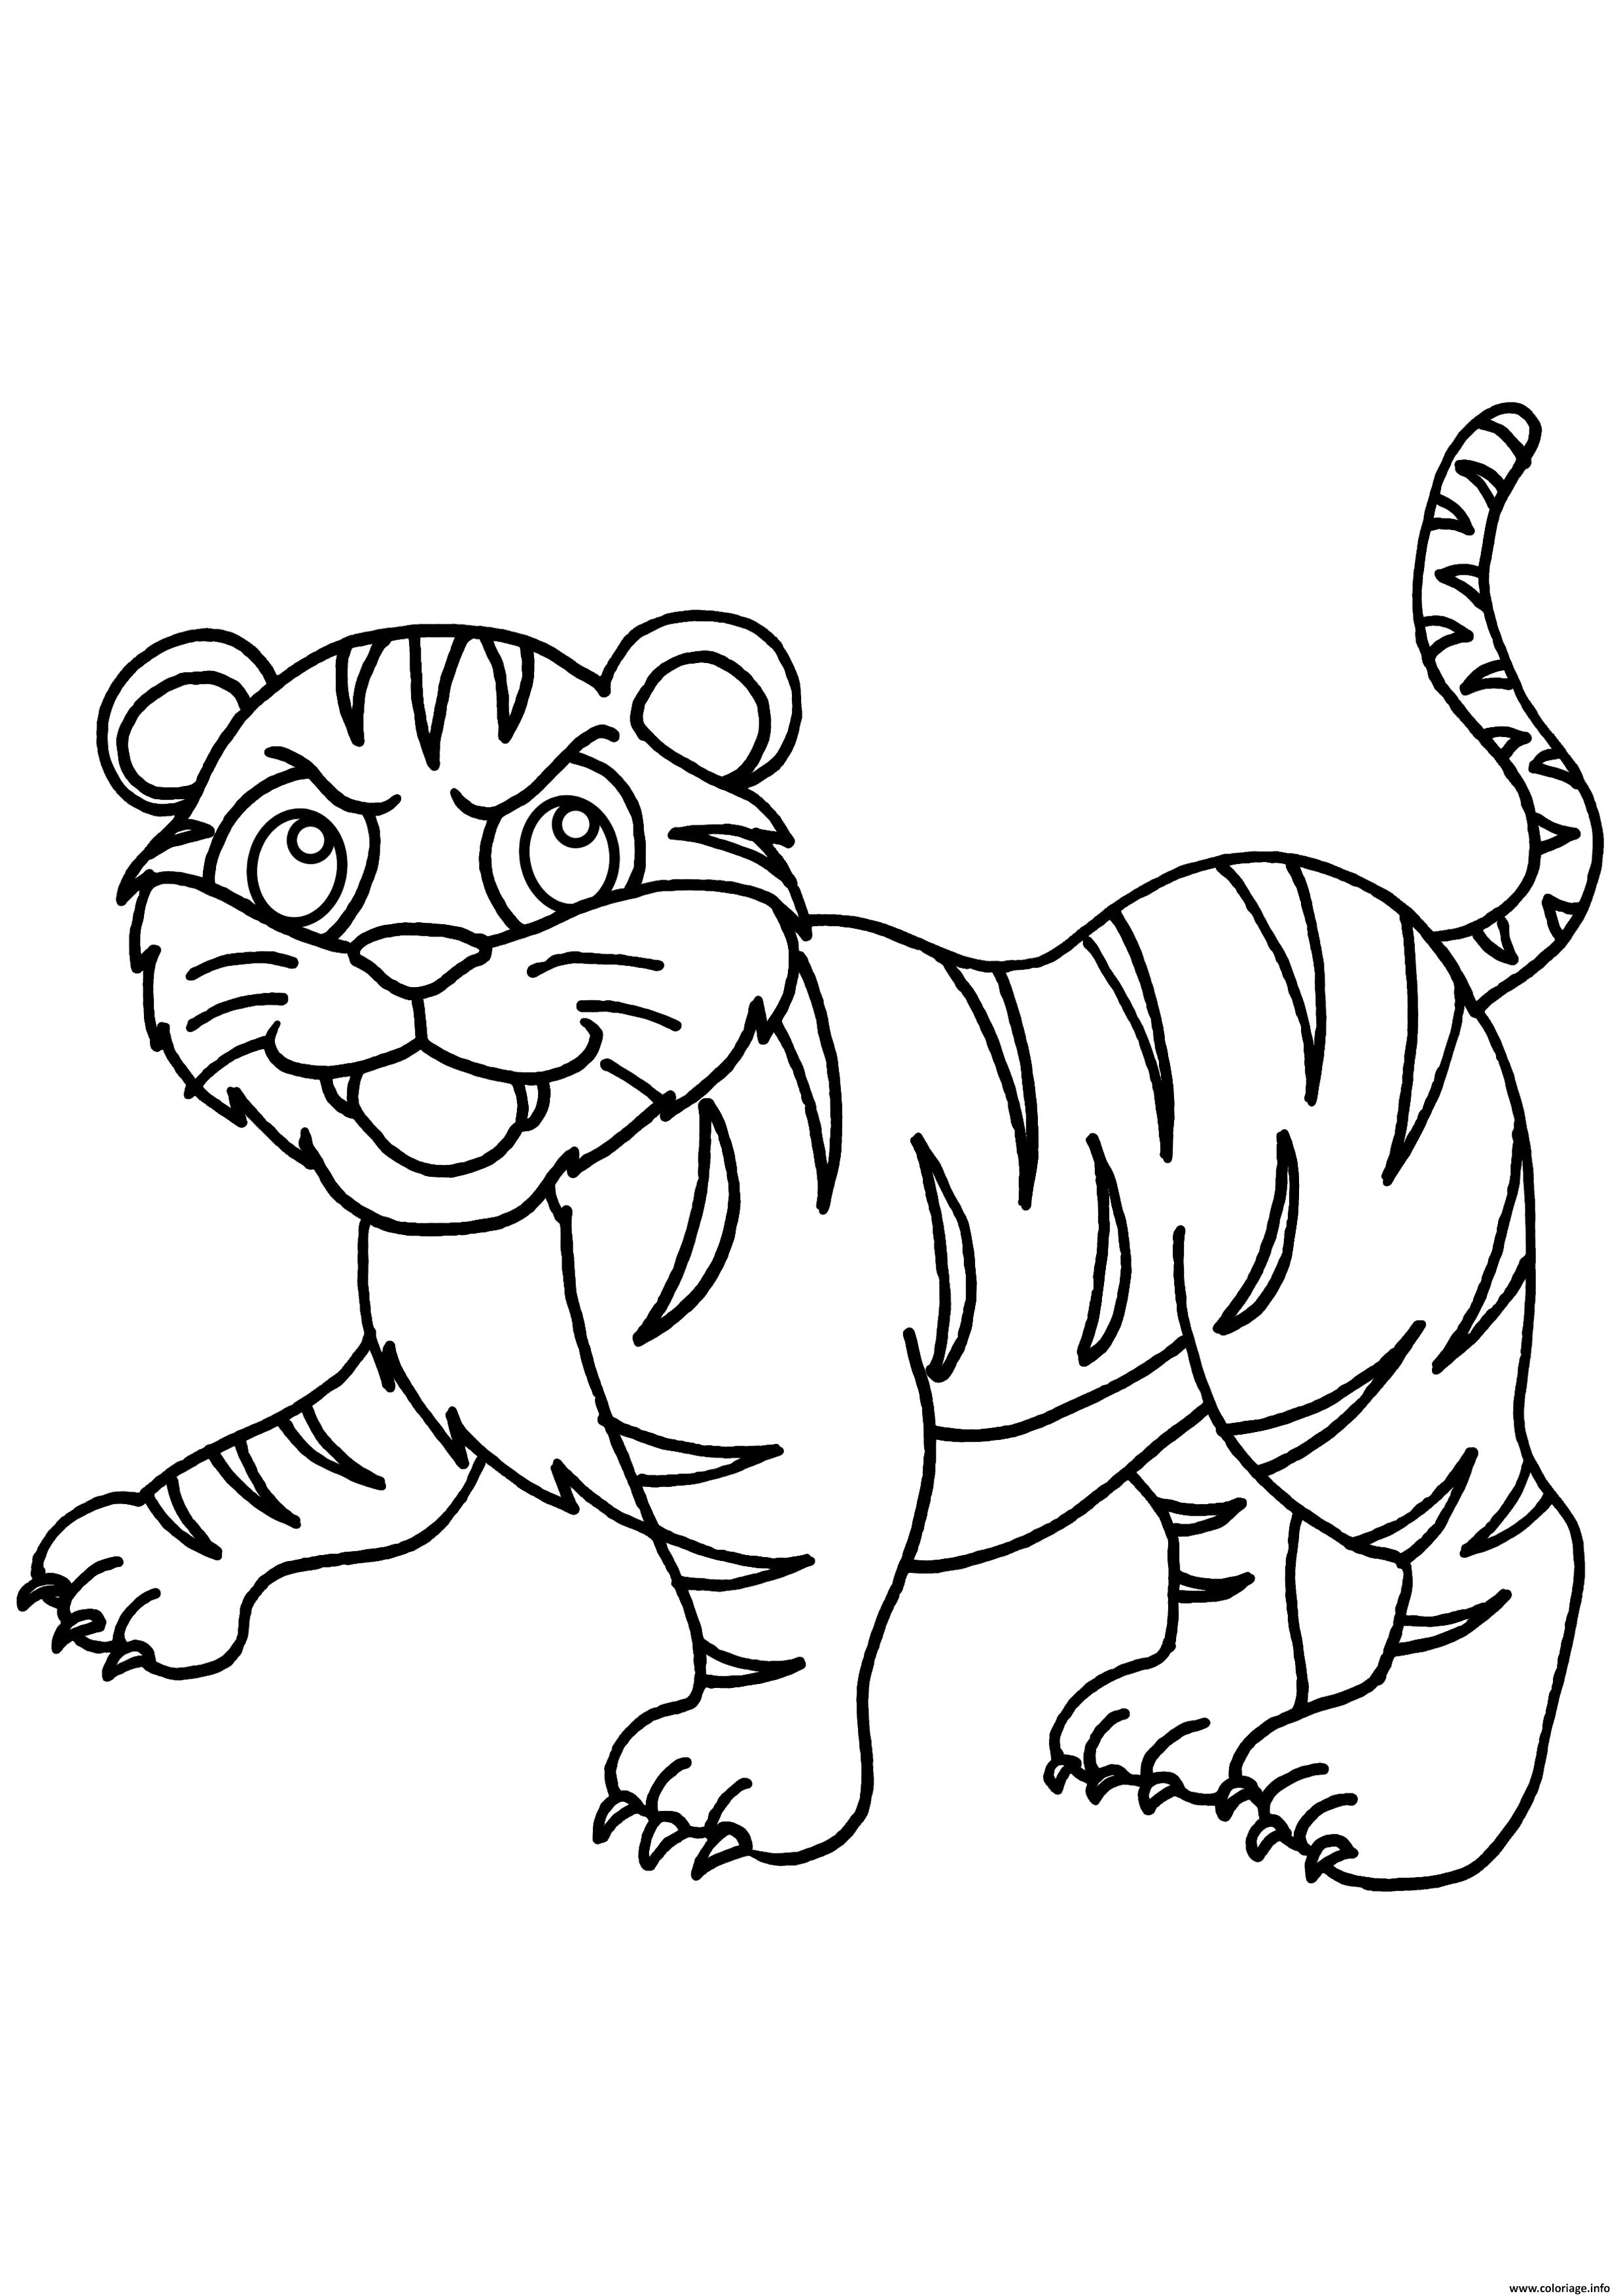 Coloriage Tigre De La Famille Panthera Tigris Dessin Tigre A Imprimer